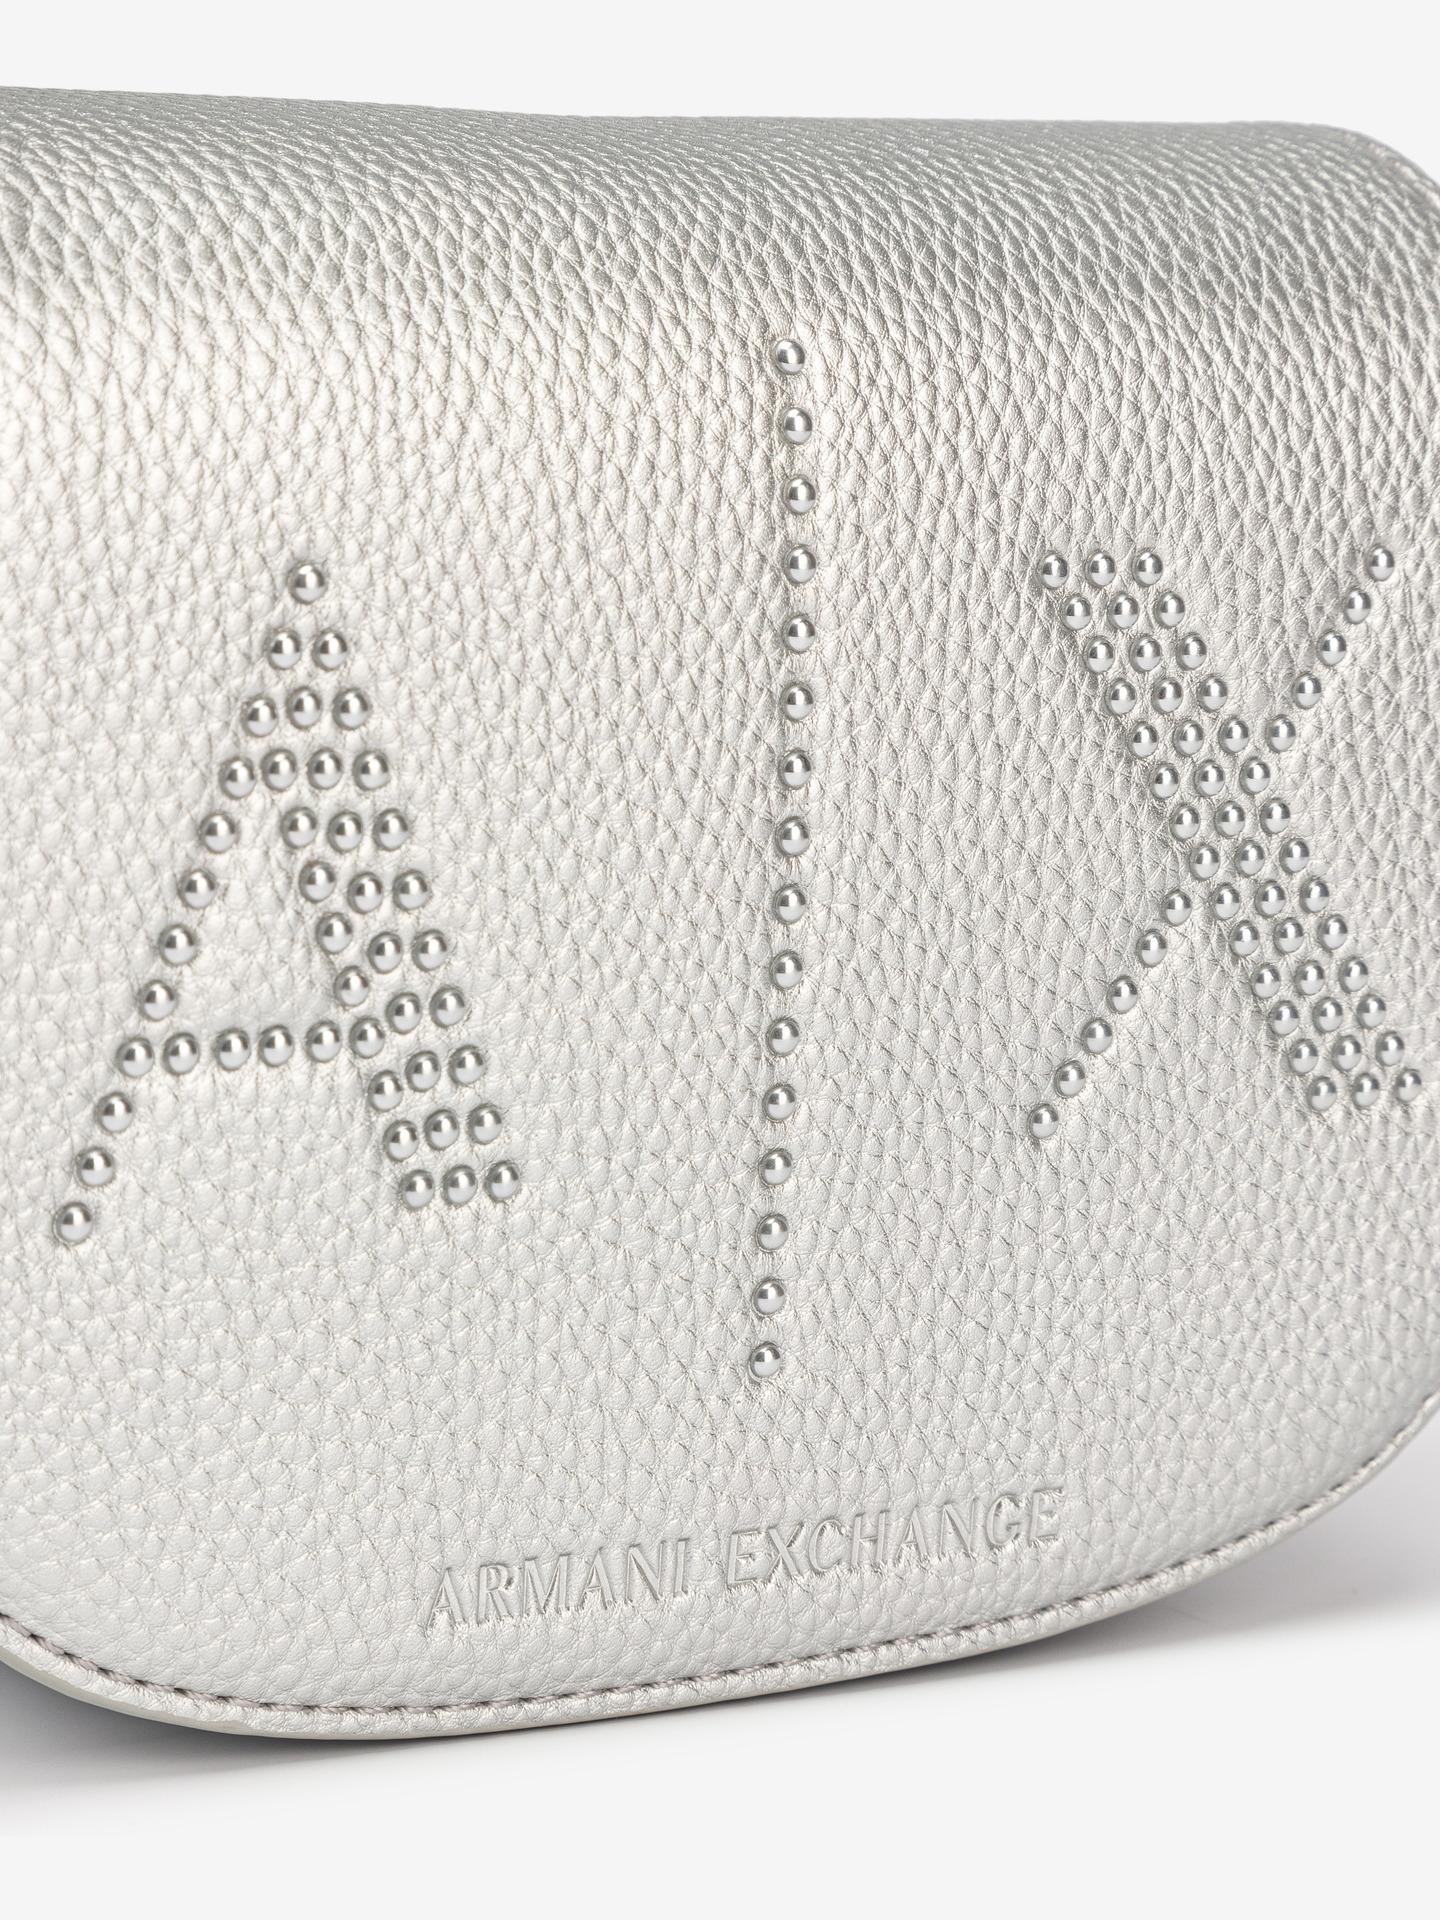 Armani Exchange srebrna torbica